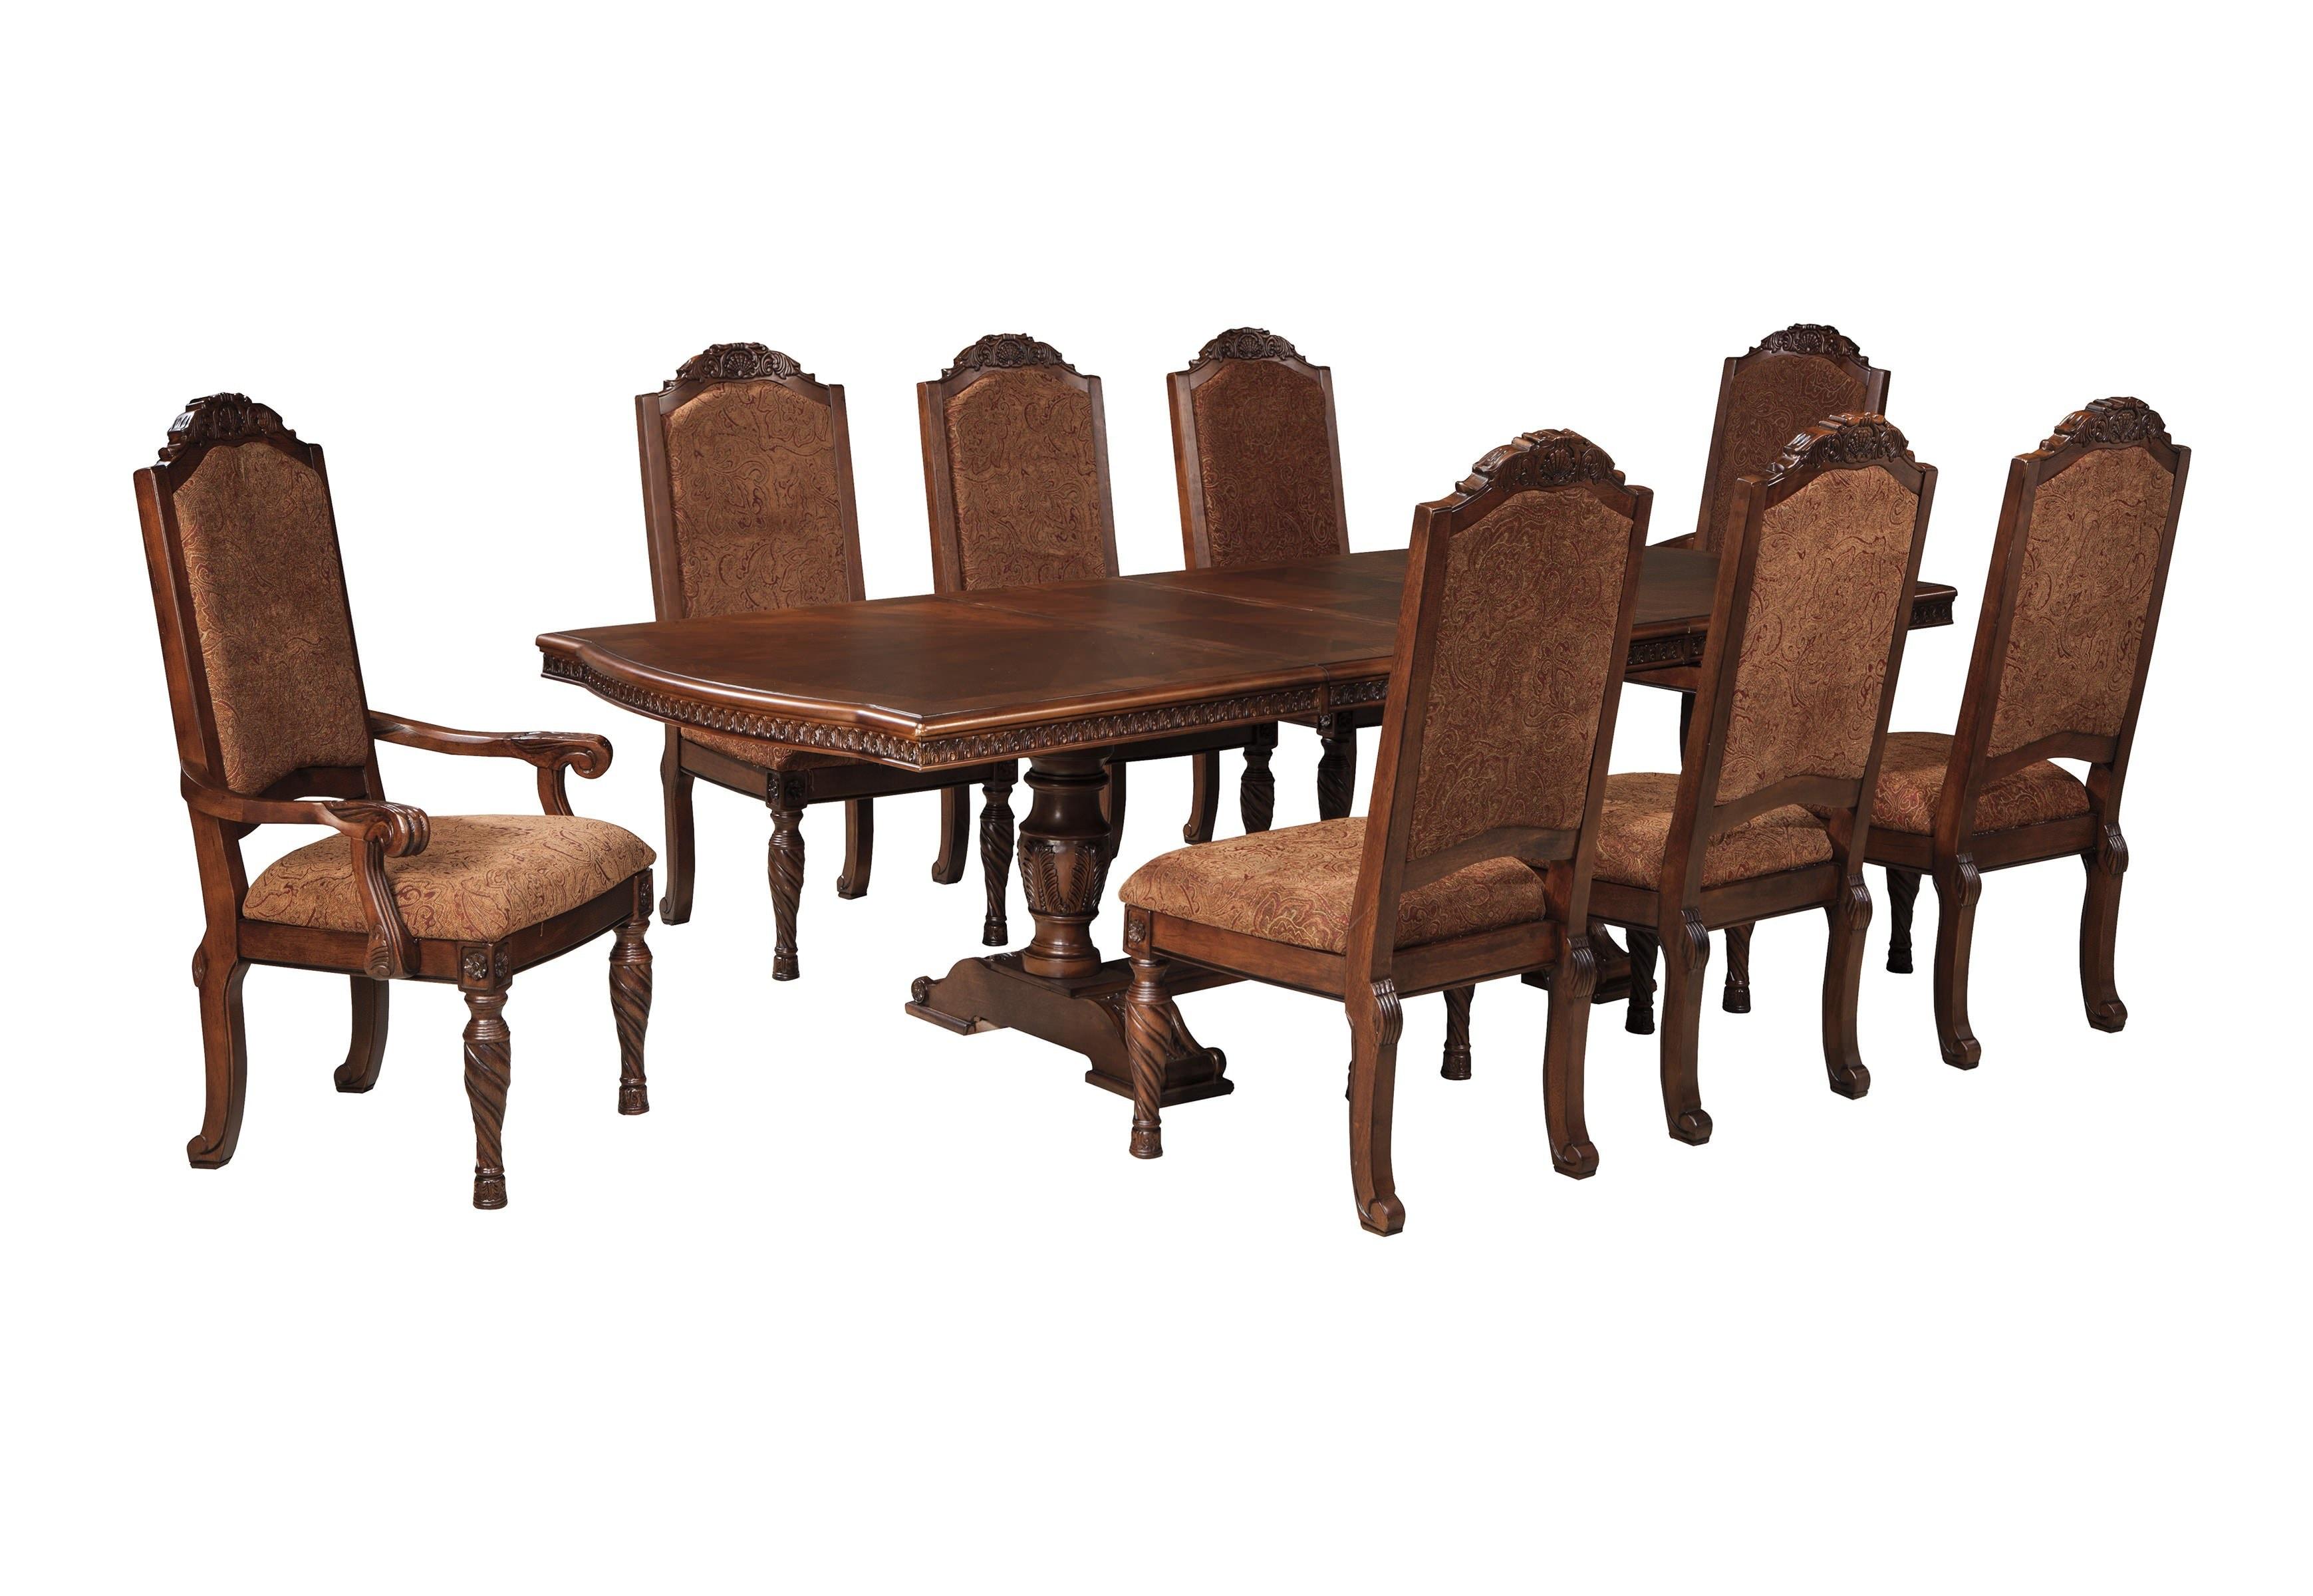 Wonderful Ashley North Shore 9 Piece Rectangular Pedestal Dining Set D553 55 02 02A